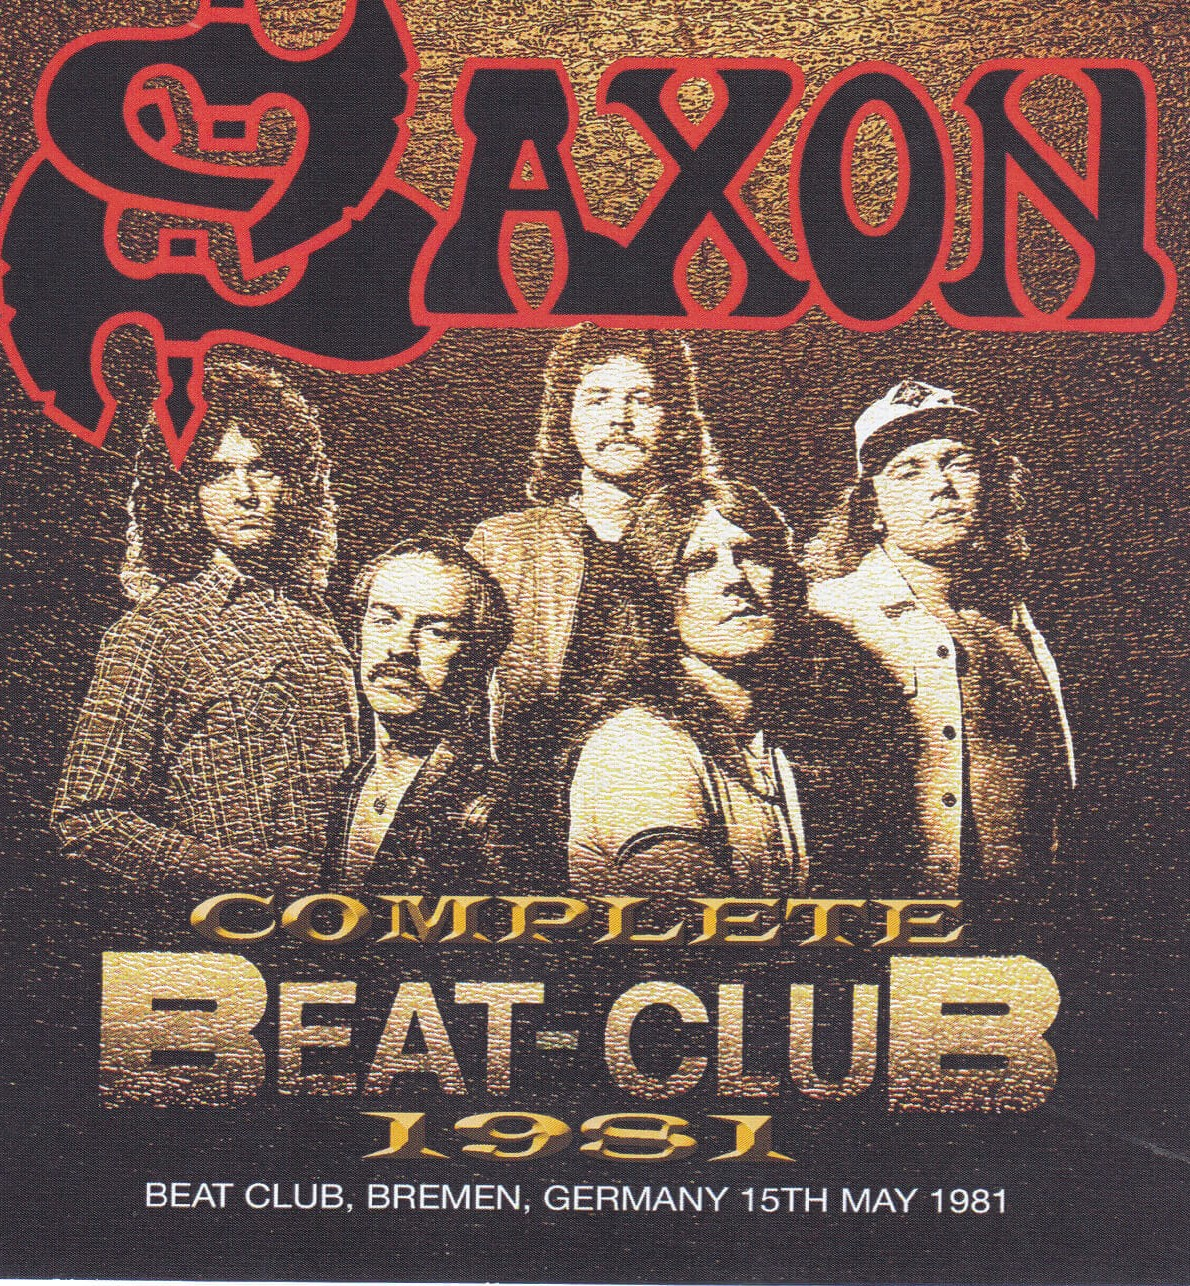 Saxon Live At The Beatclub, Btemen Germany 1981 DVD